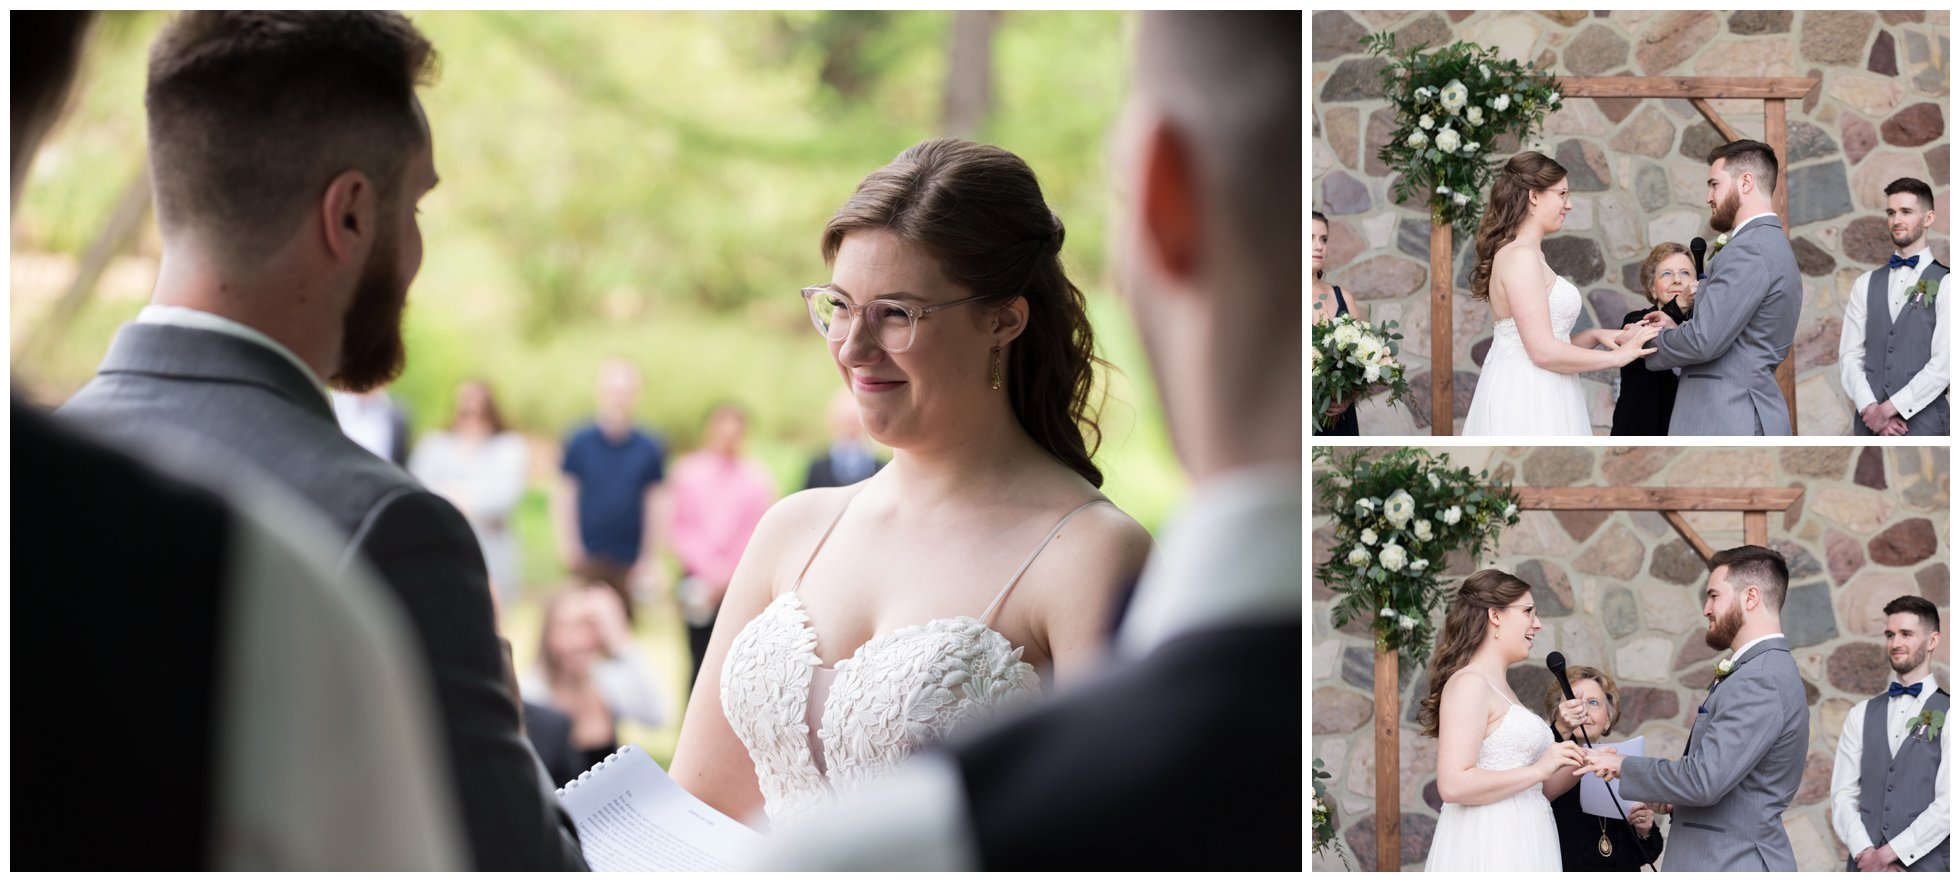 Emily and Royden Edmonton Wedding (Life by Selena Photography)_0012.jpg